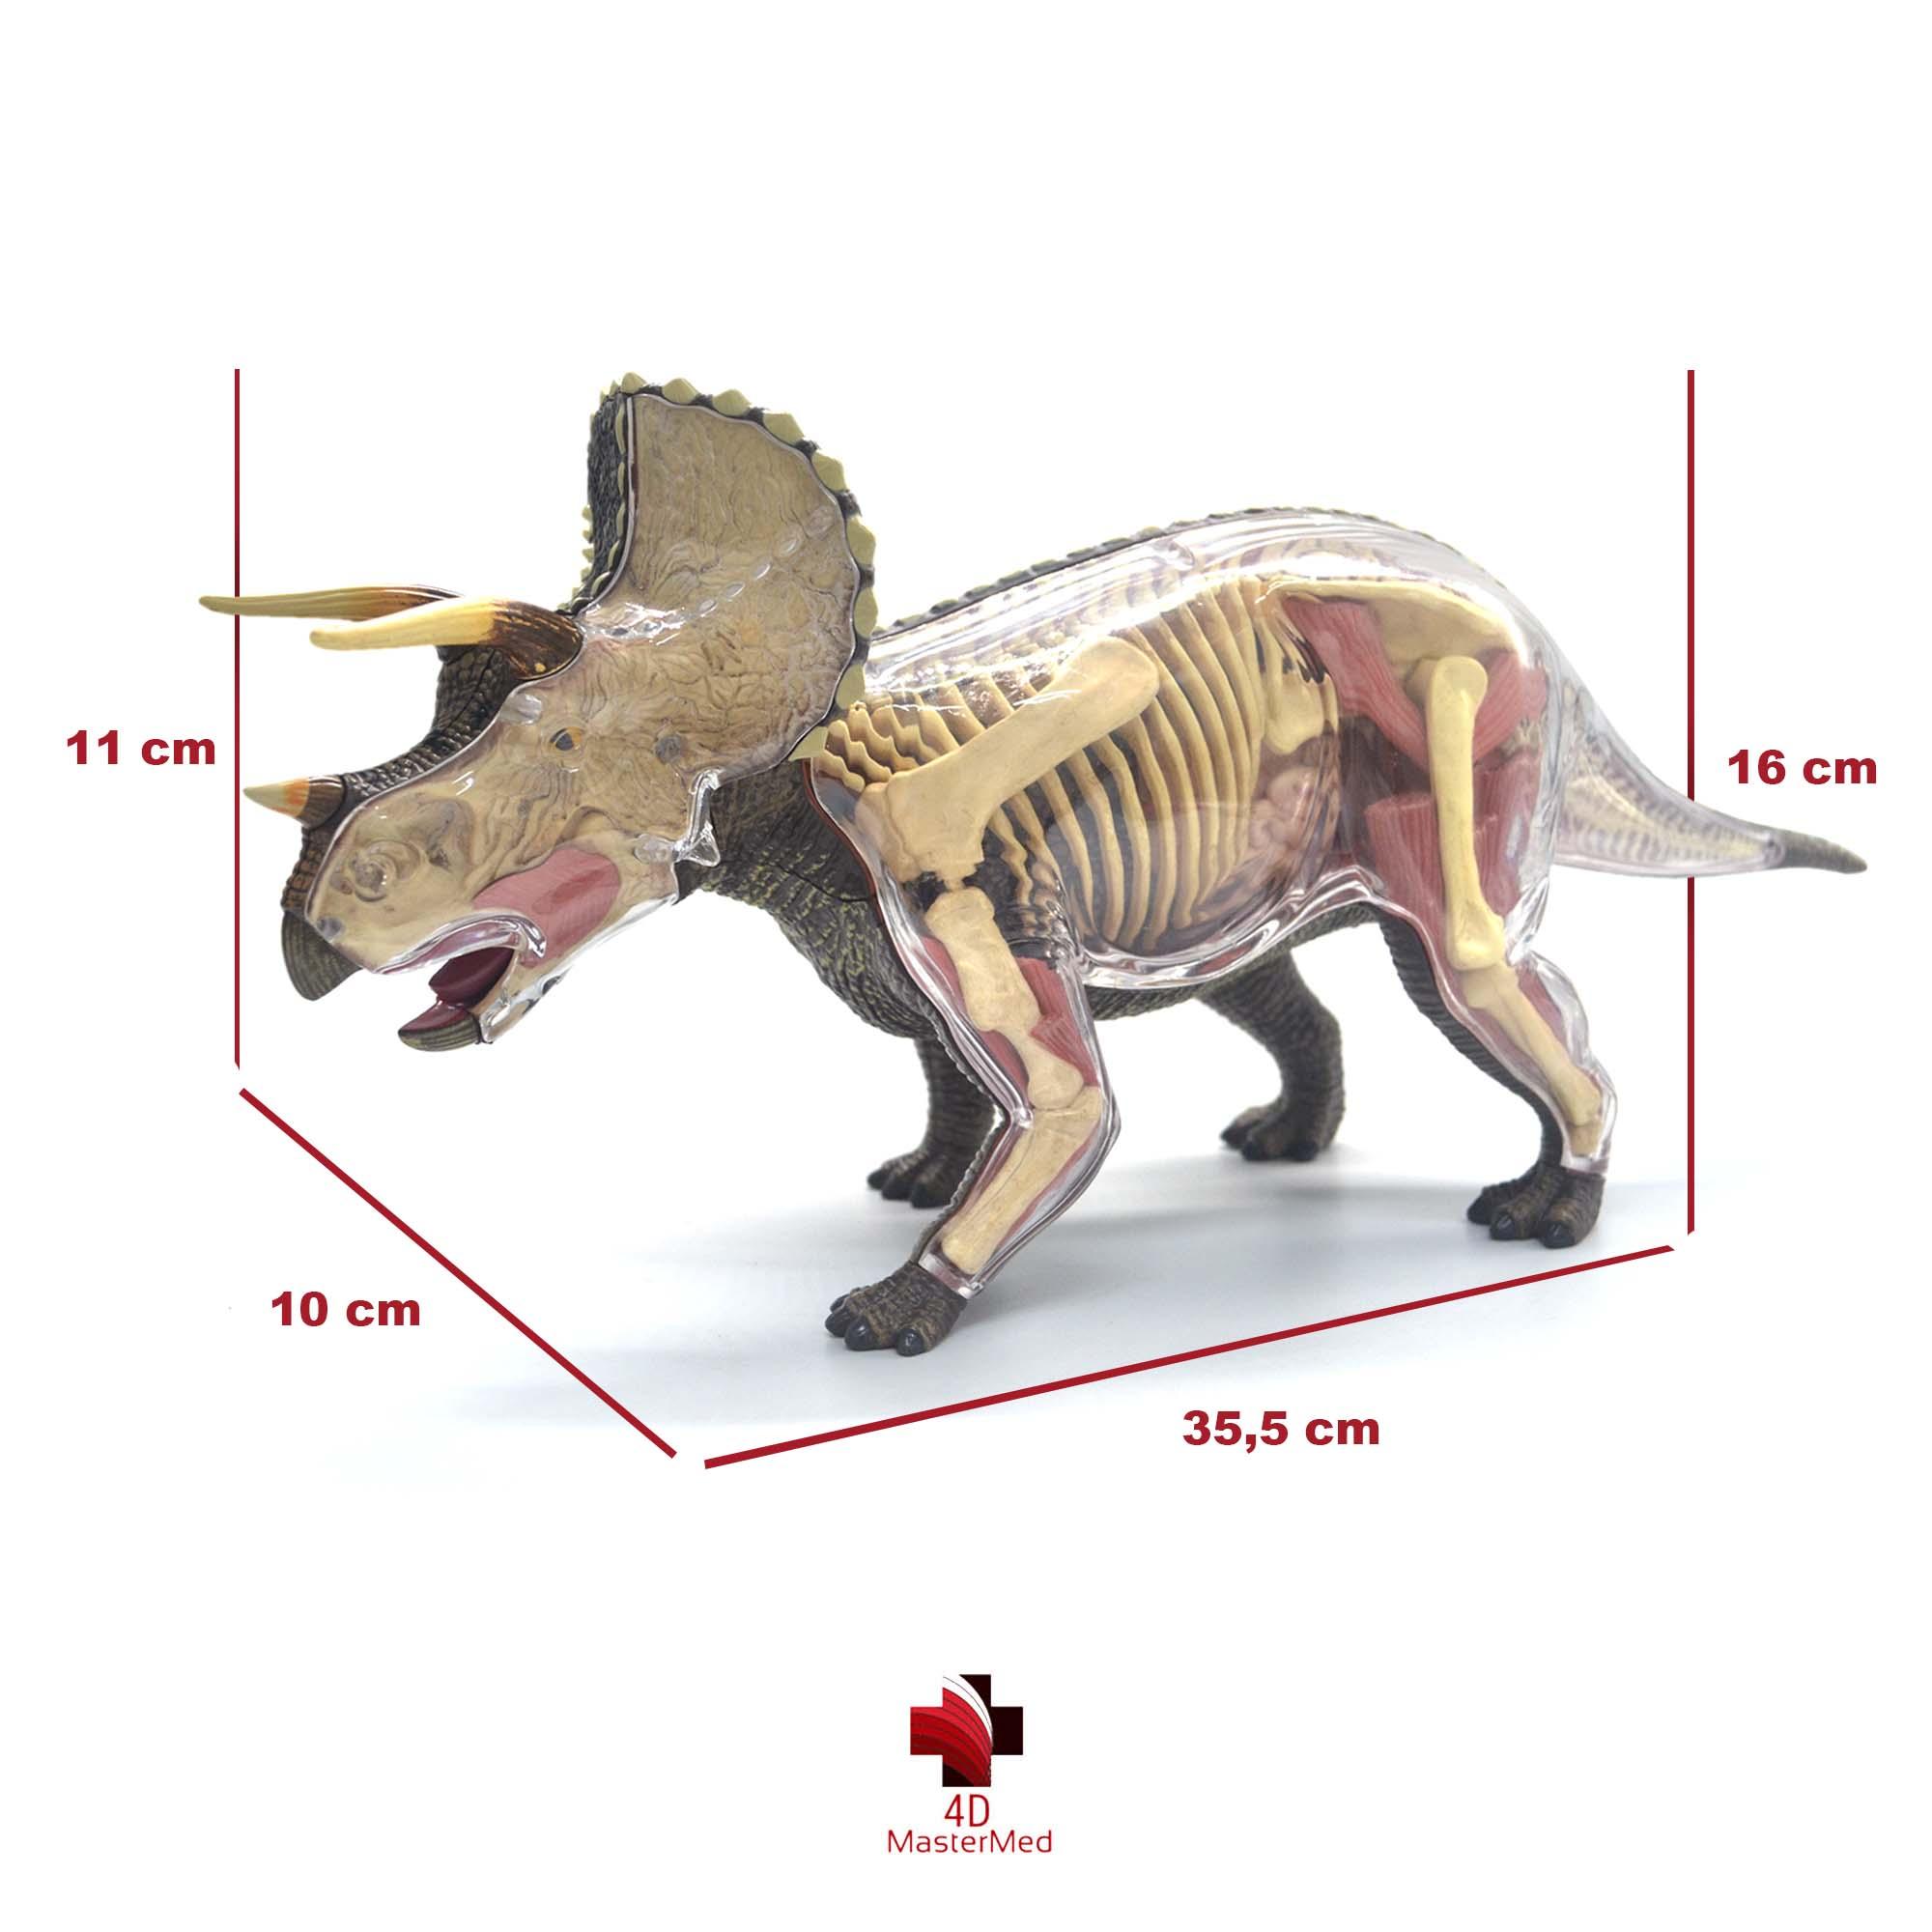 Anatomia do Triceratops